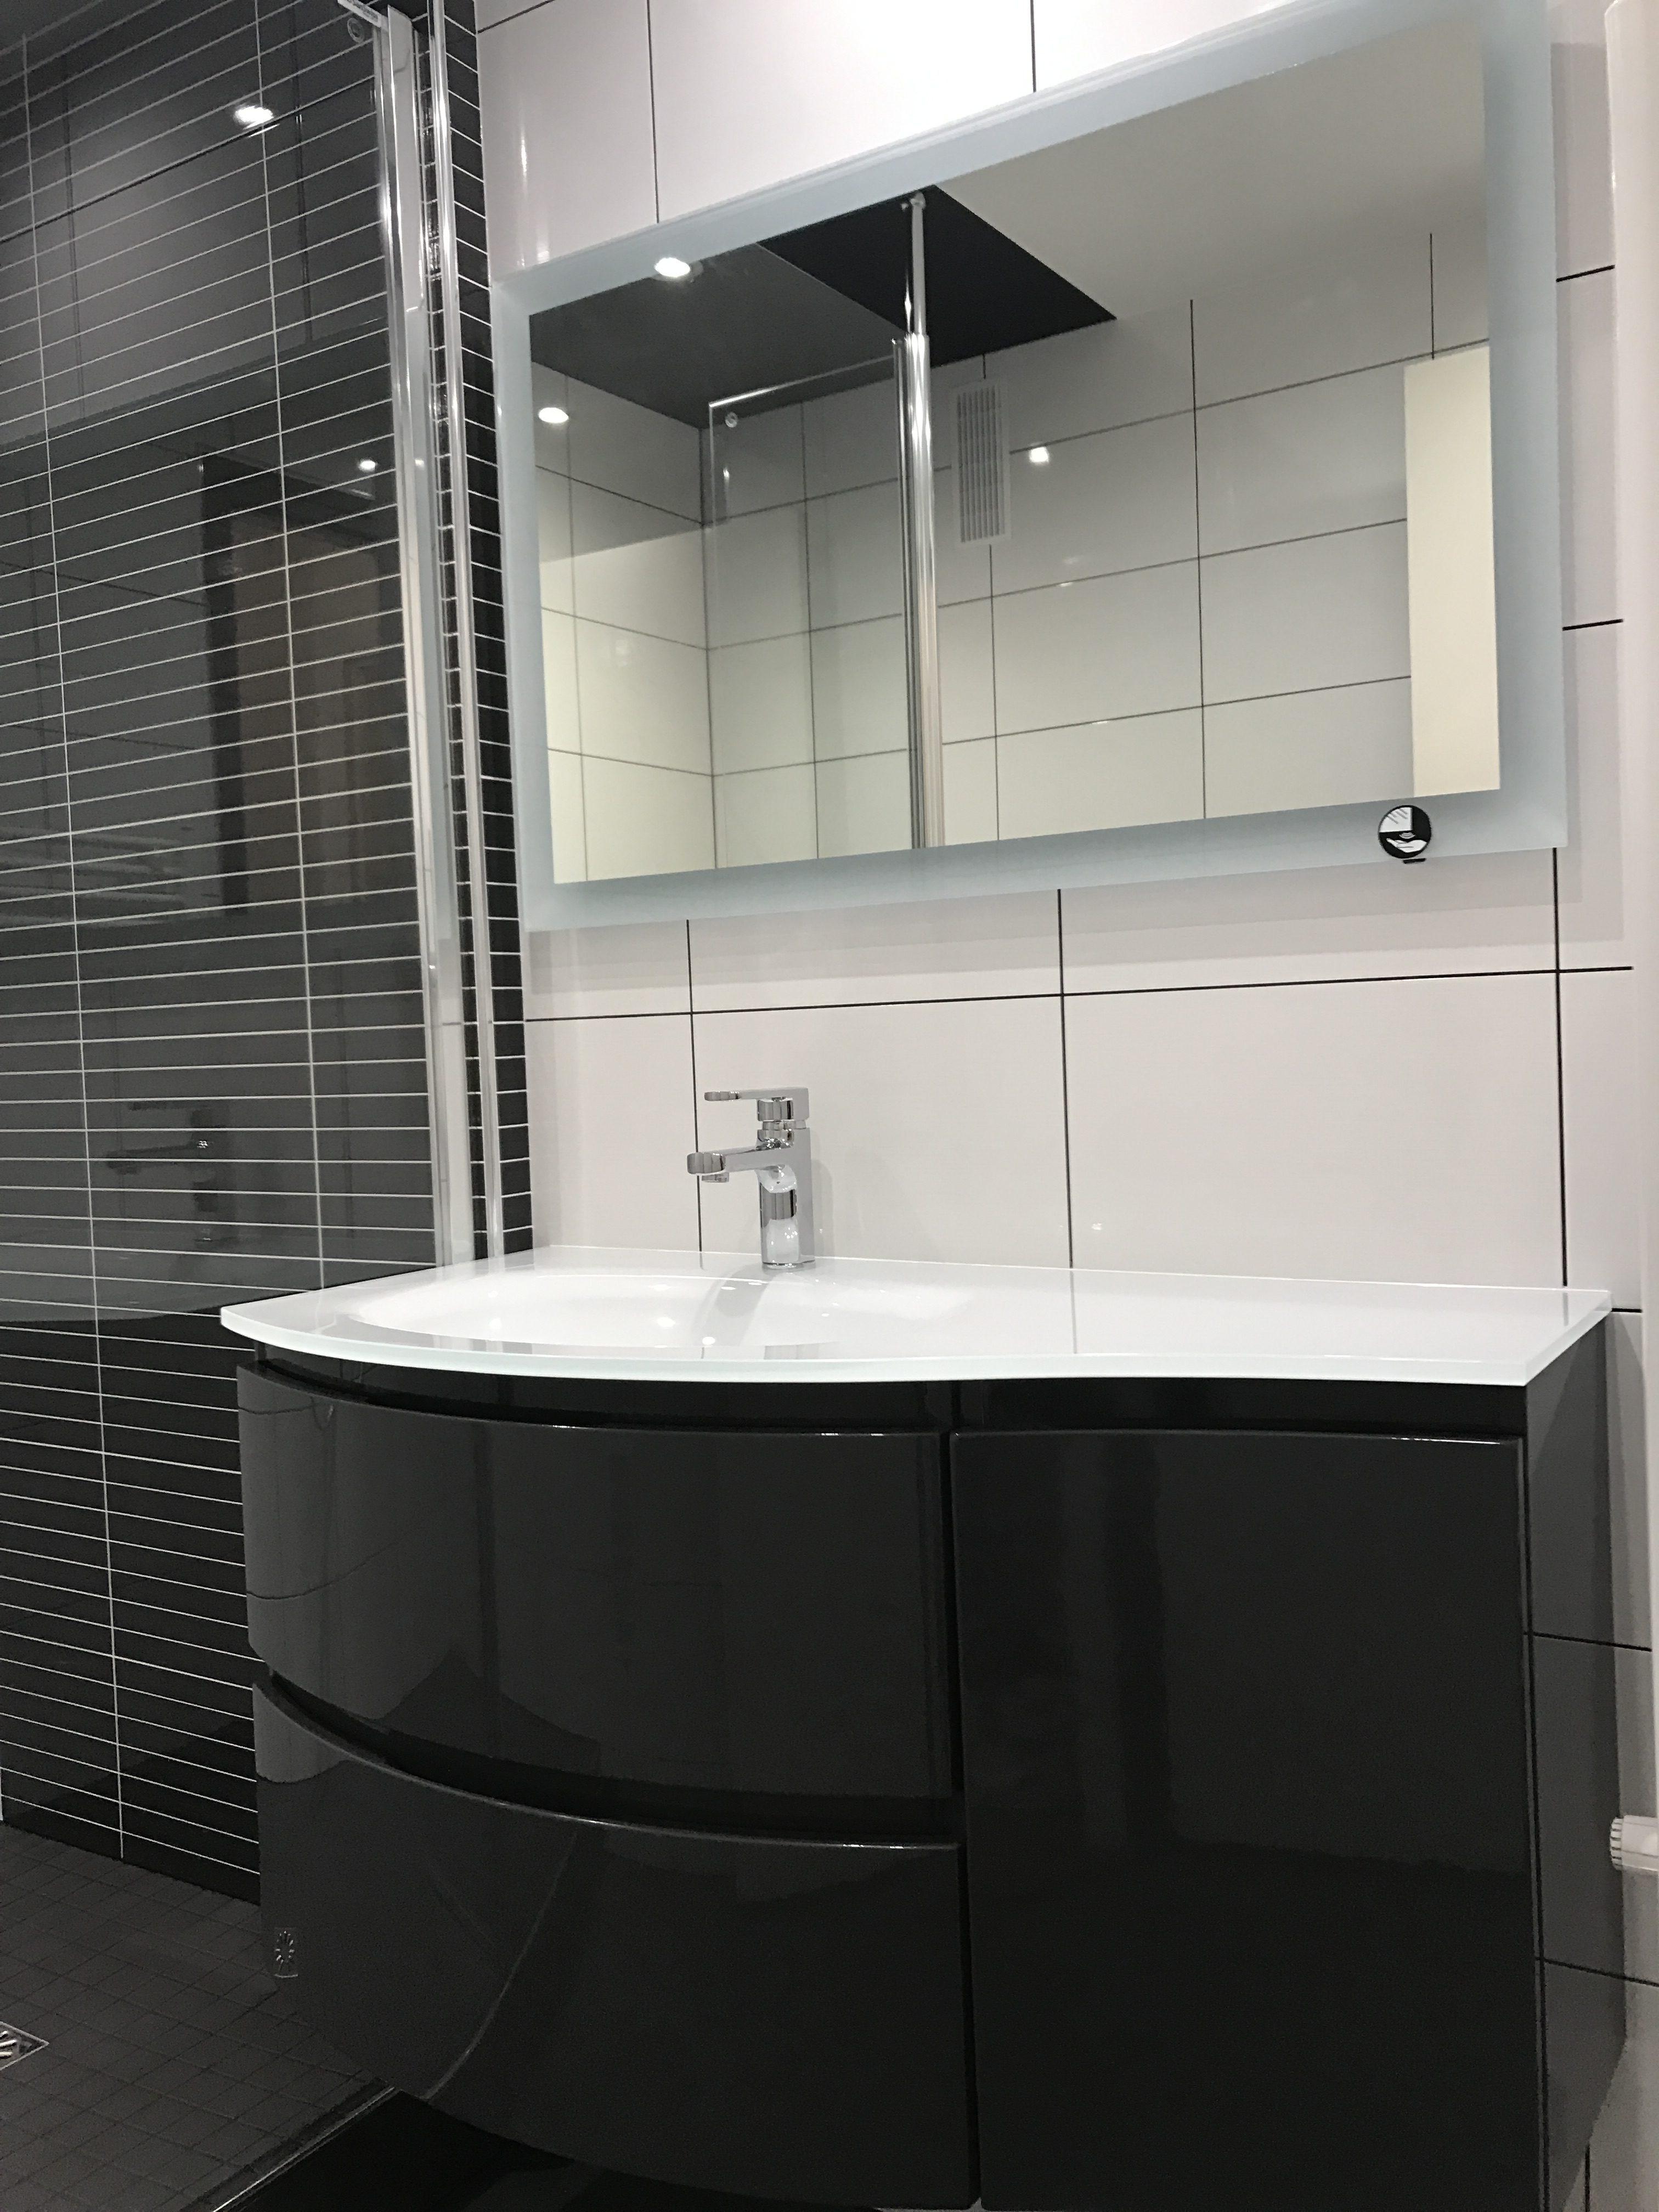 realisation-salle-de-bain-lcrdp-renovation-orleans-10